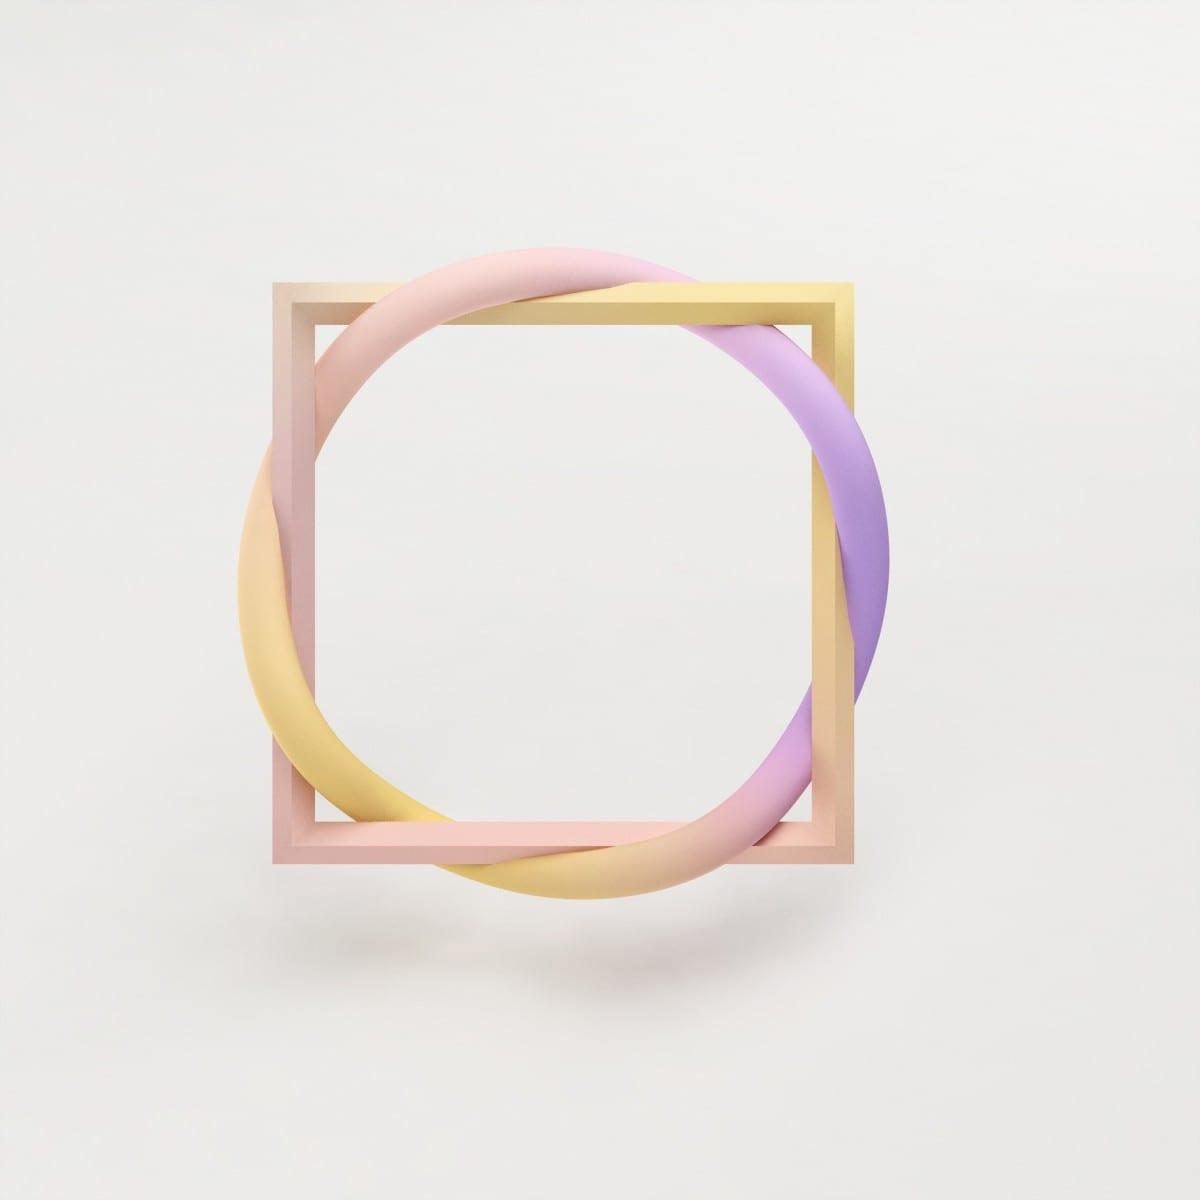 Maiko Gubler, Gradient Bangles, Frame, digital model/ dimensions variable, 2013